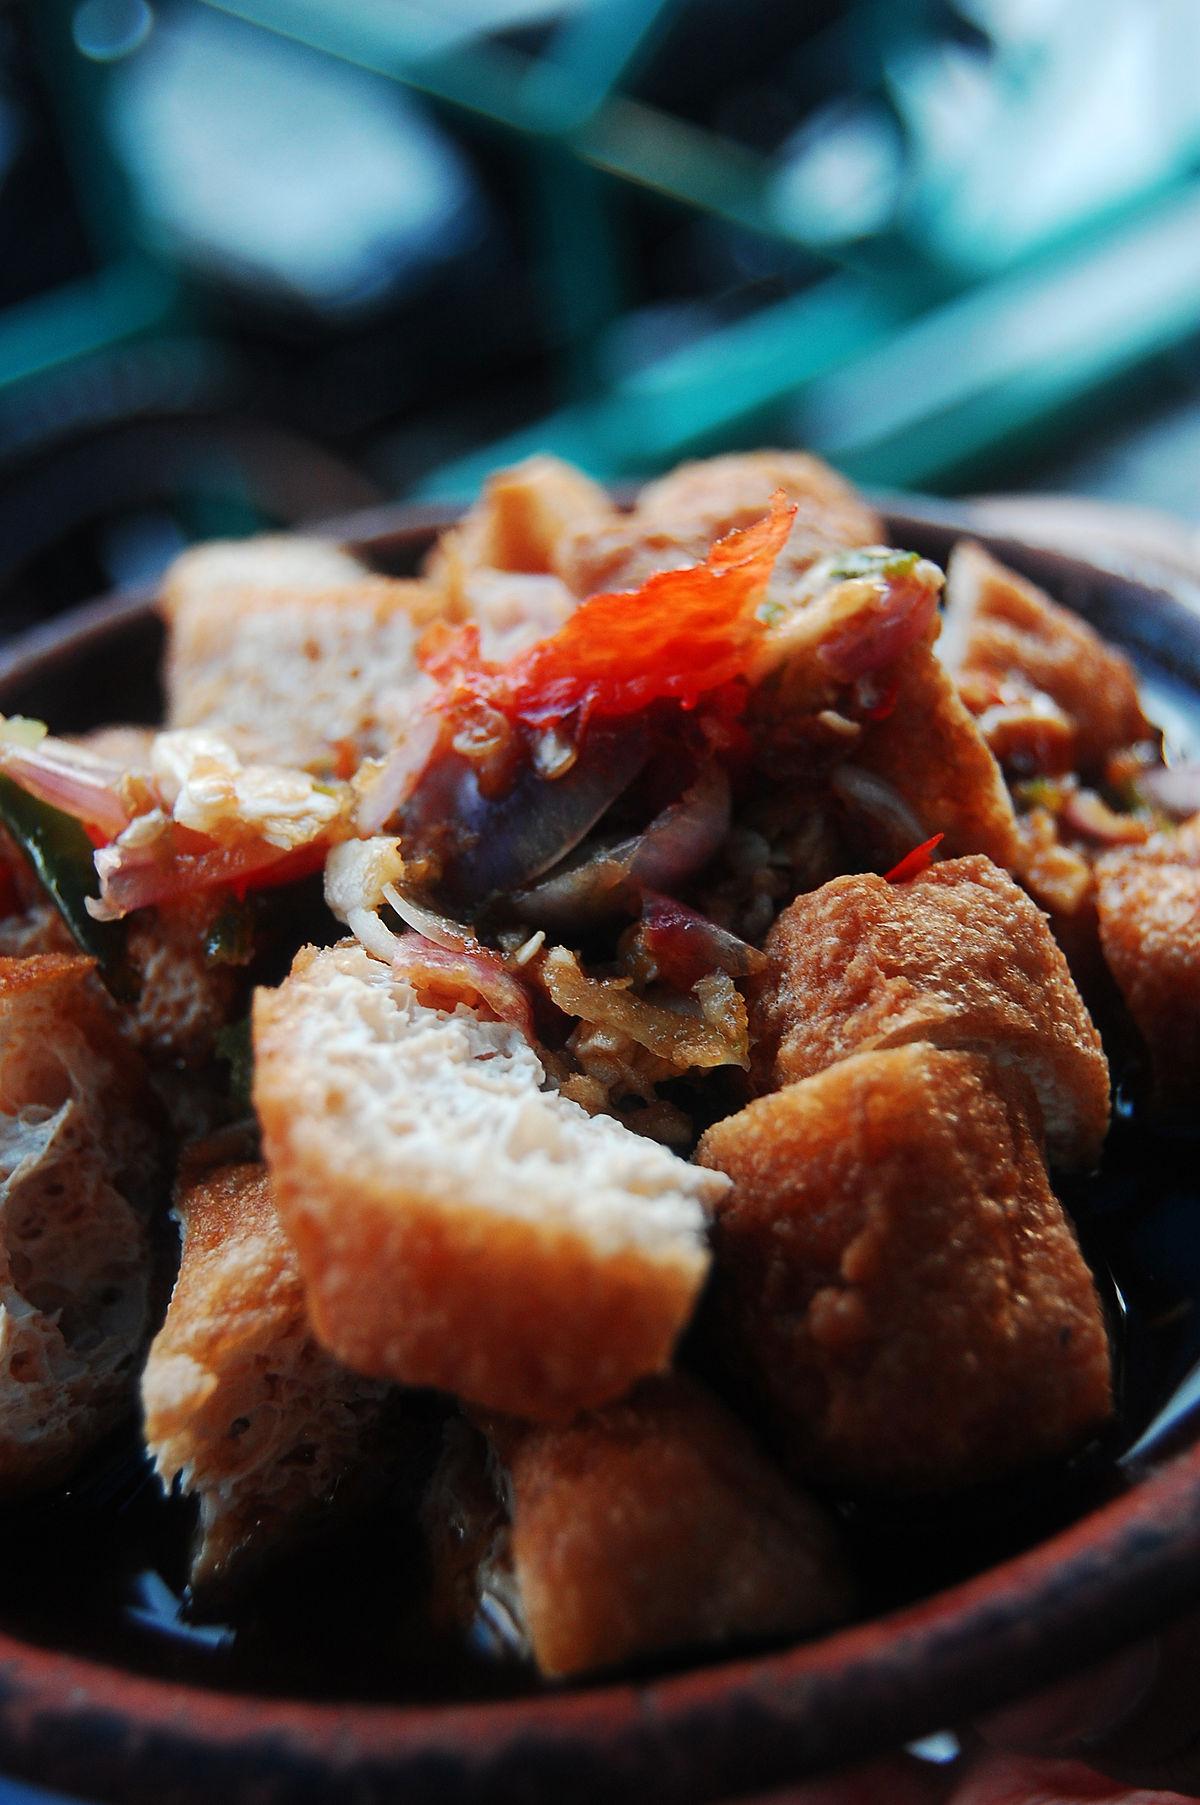 Resep Tahu Gejrot Cirebon : resep, gejrot, cirebon, Gejrot, Wikipedia